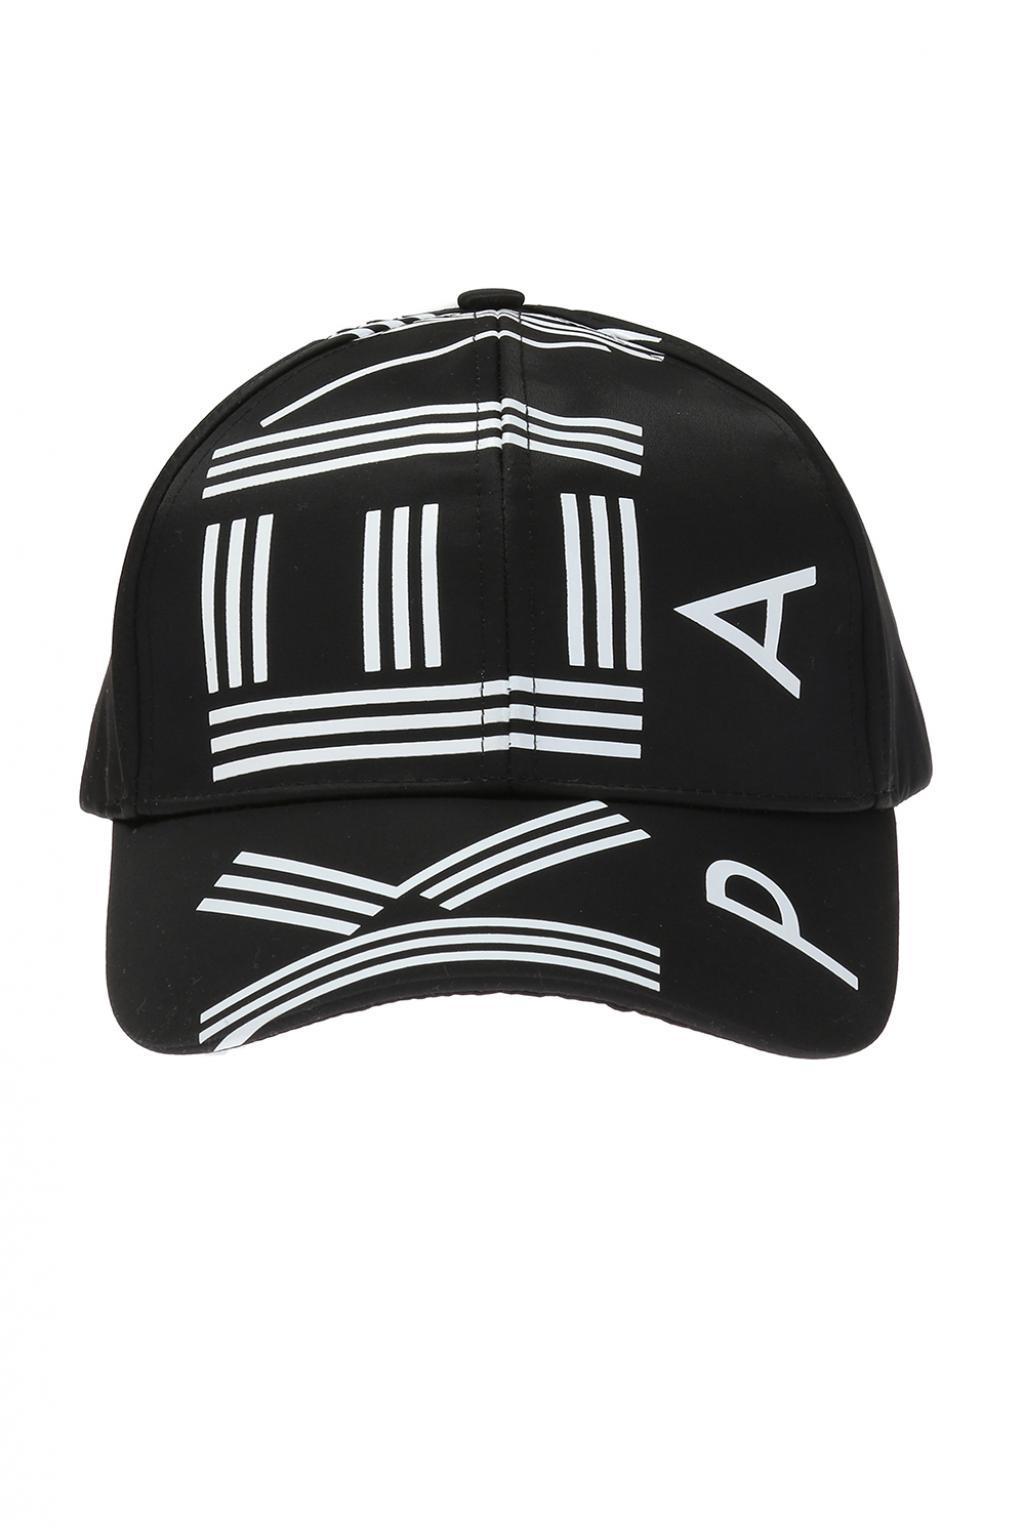 5c5ce106dc2 Lyst - KENZO Baseball Cap With Logo in Black for Men